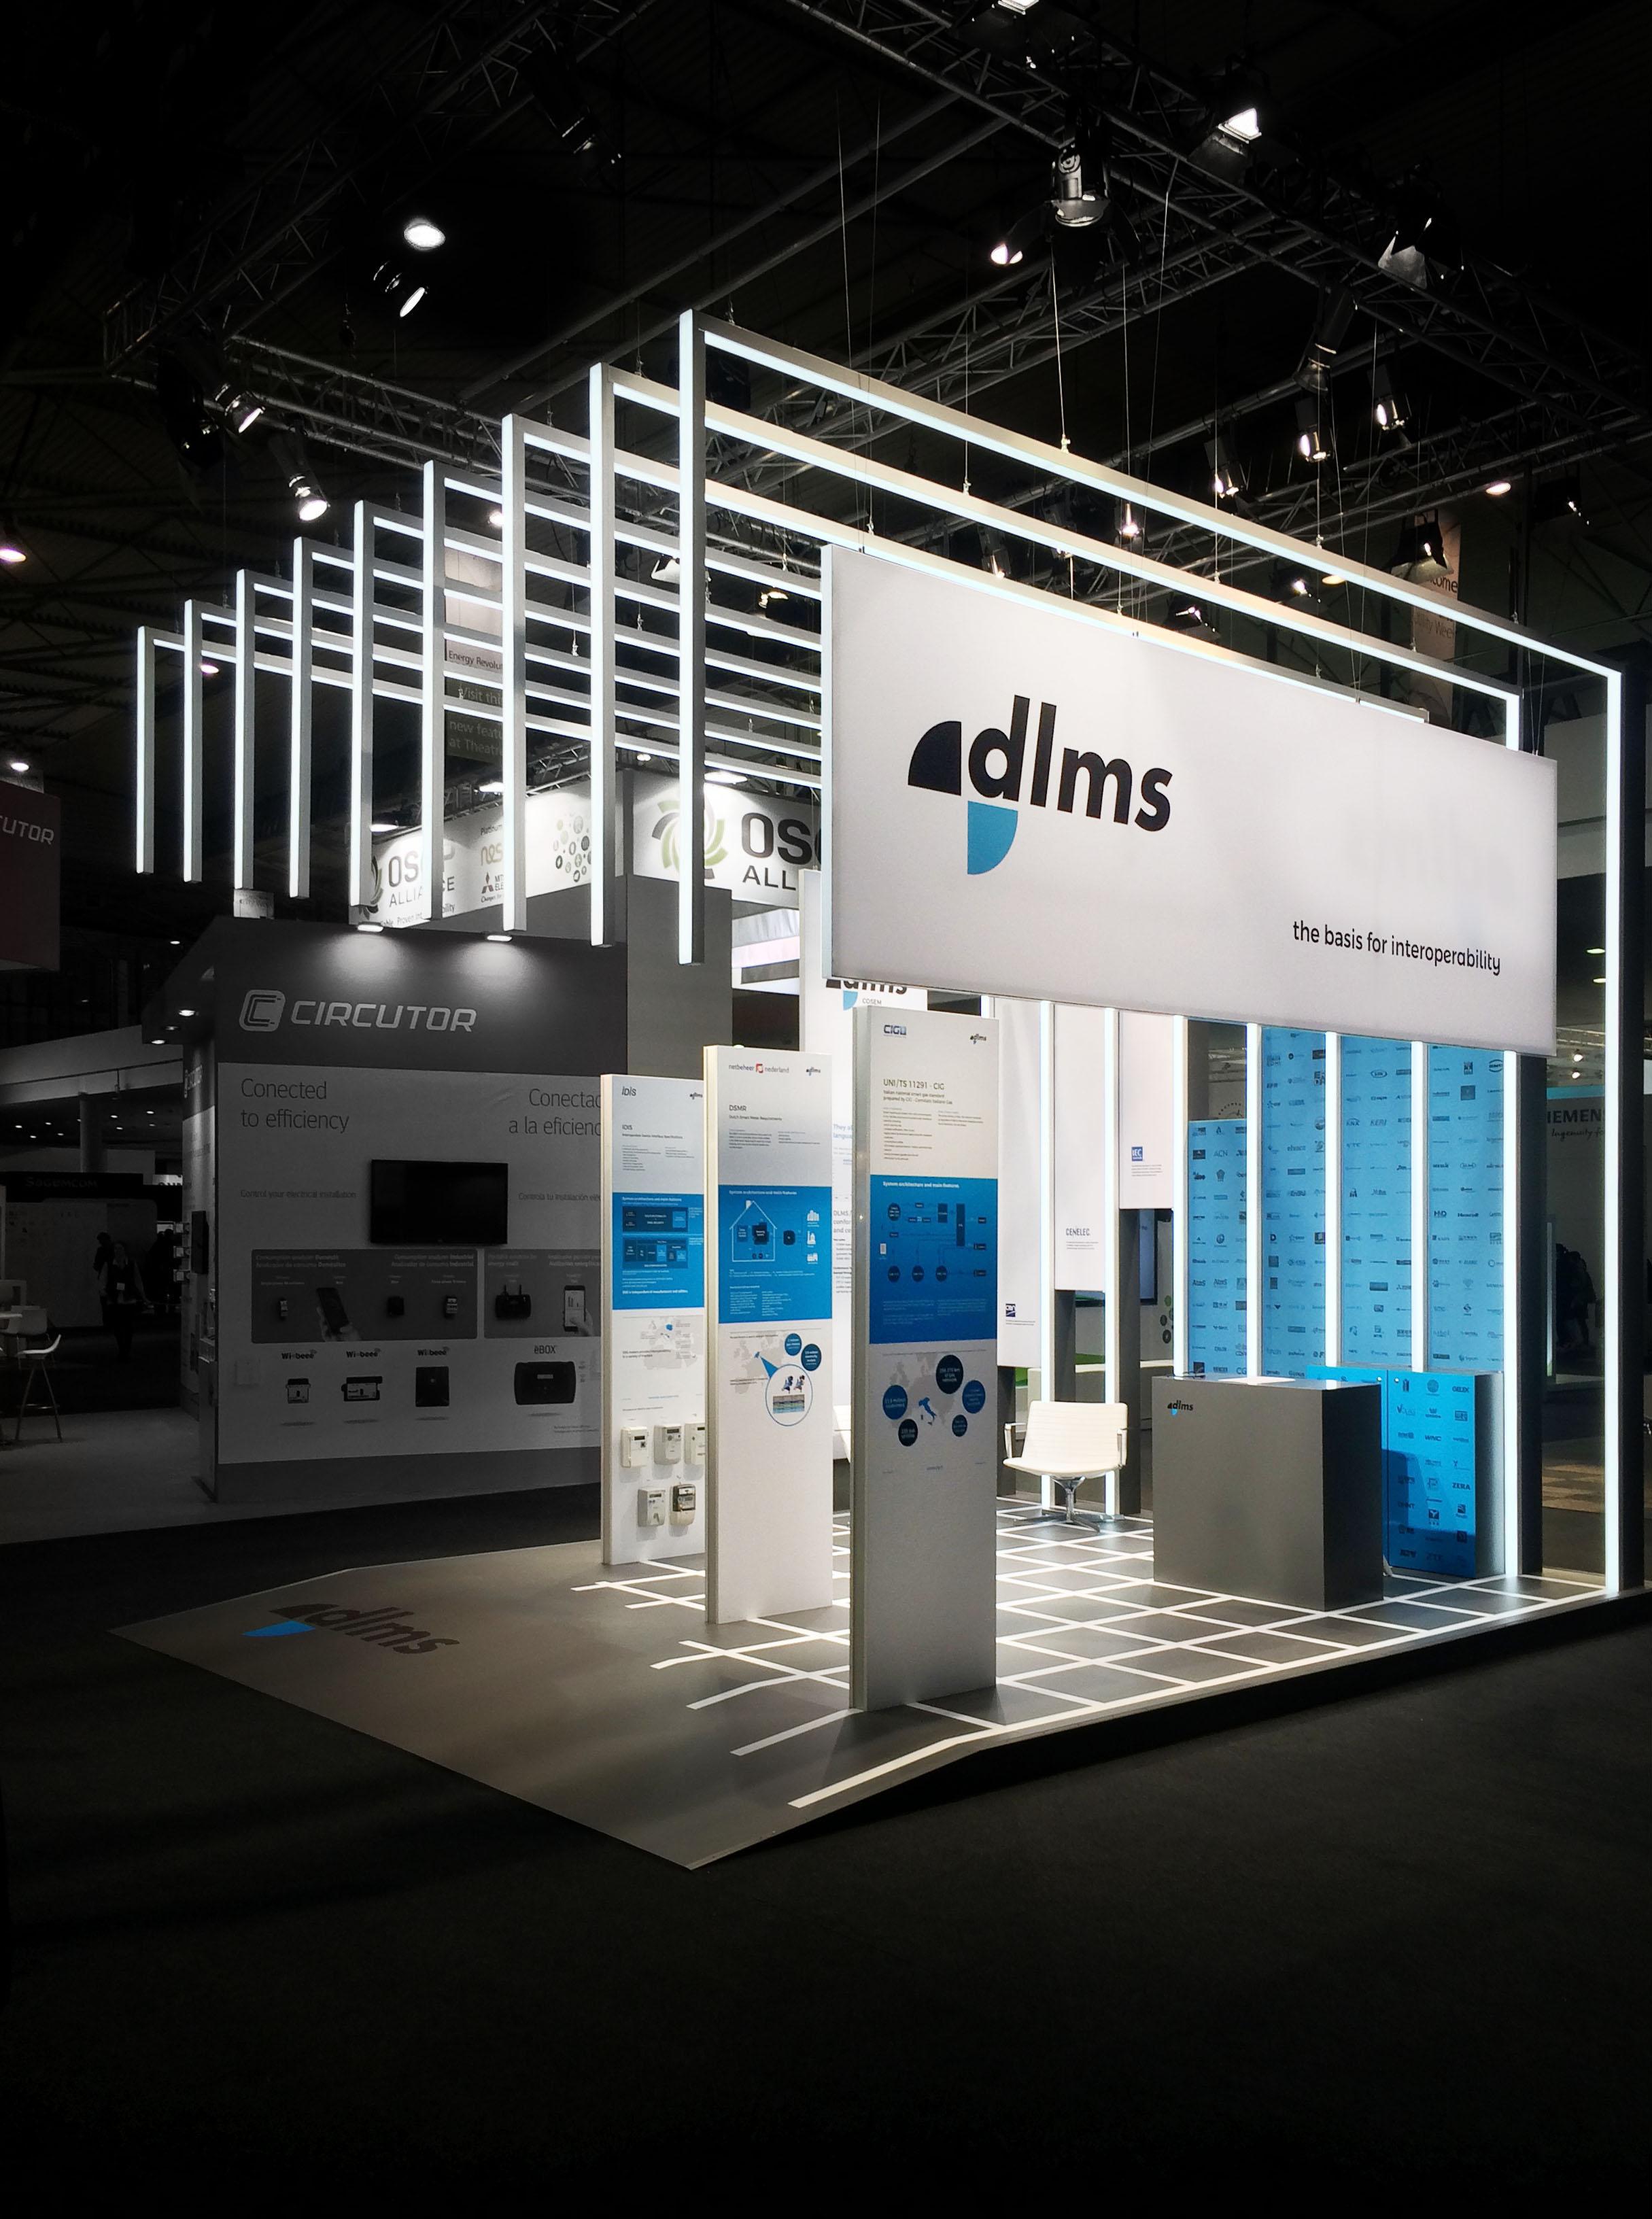 dlms_tradefair-exhibition-design_coordination-berlin_02.jpg